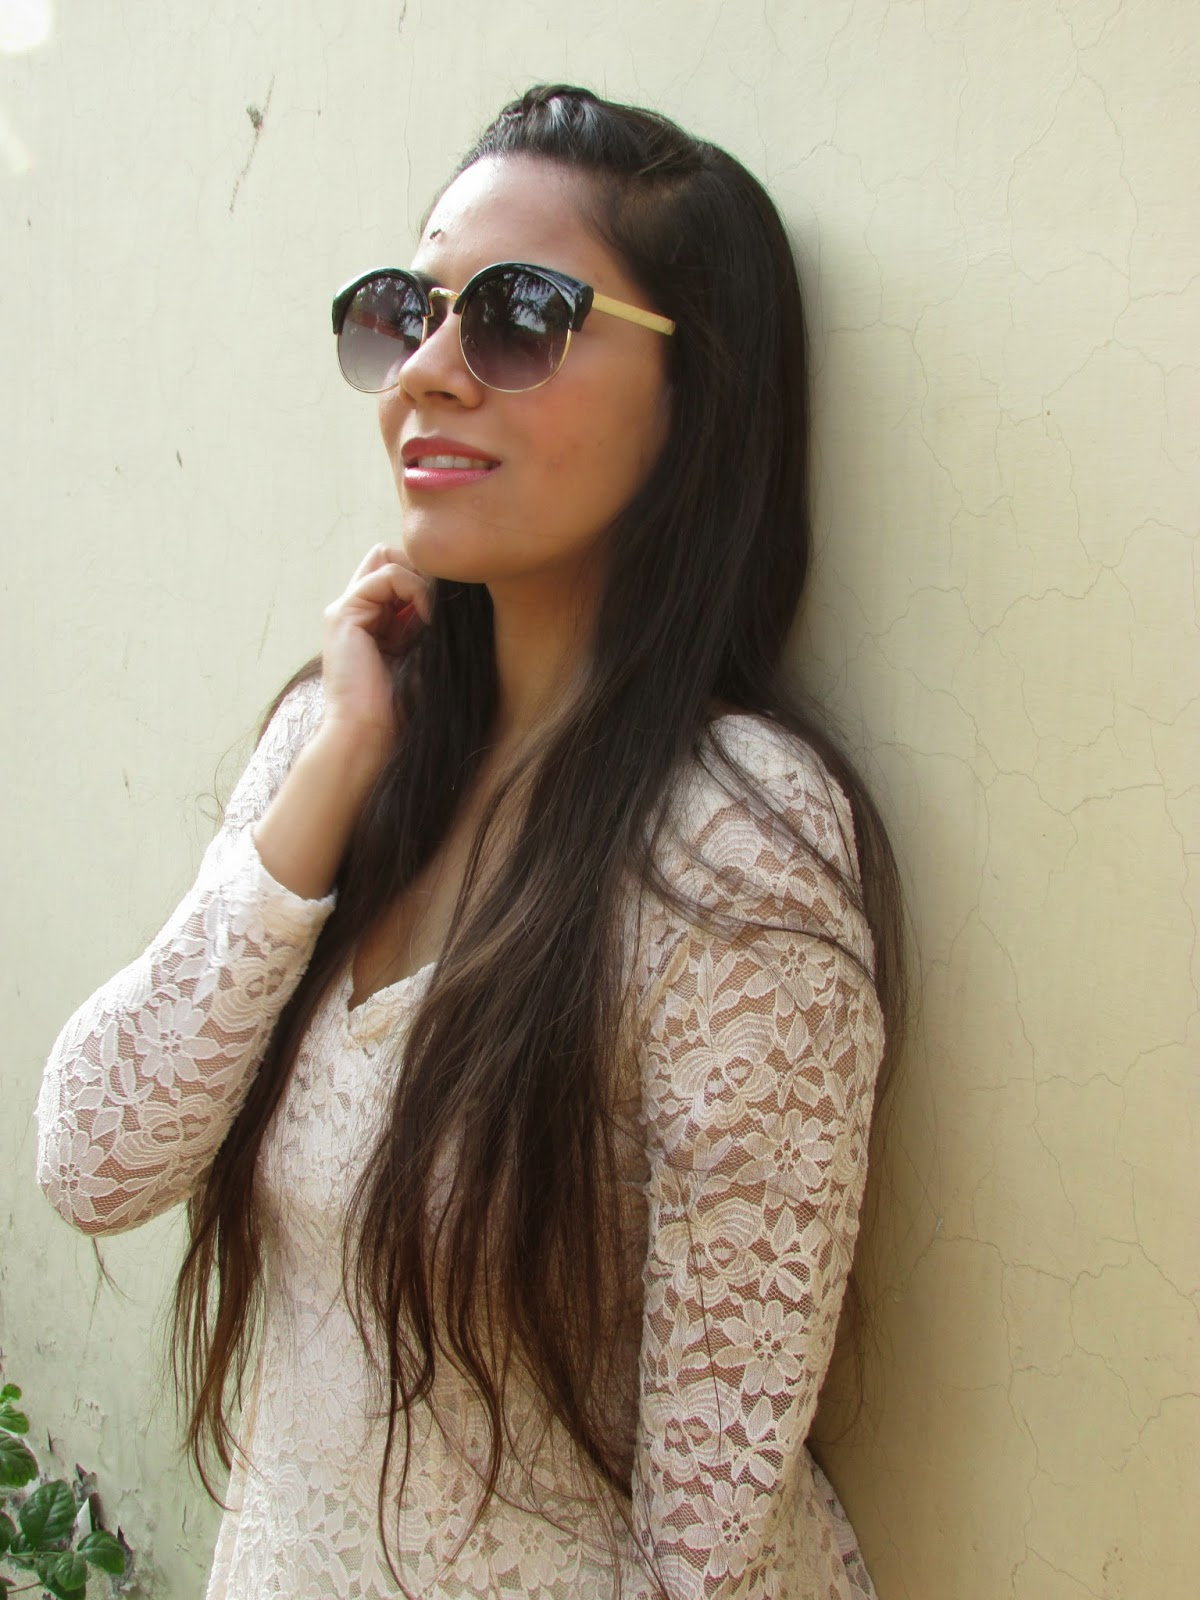 cheap sunglasses india, cheap vintage sunglasses, fashion, OASAP, Sunglasses, vintage round sunglasses, oasap review, oasap online , oasap sunglasses, oasap website review, oasap fashion , oasap vintage sunglasses,vintage sunglasses,indian dahion bloggger